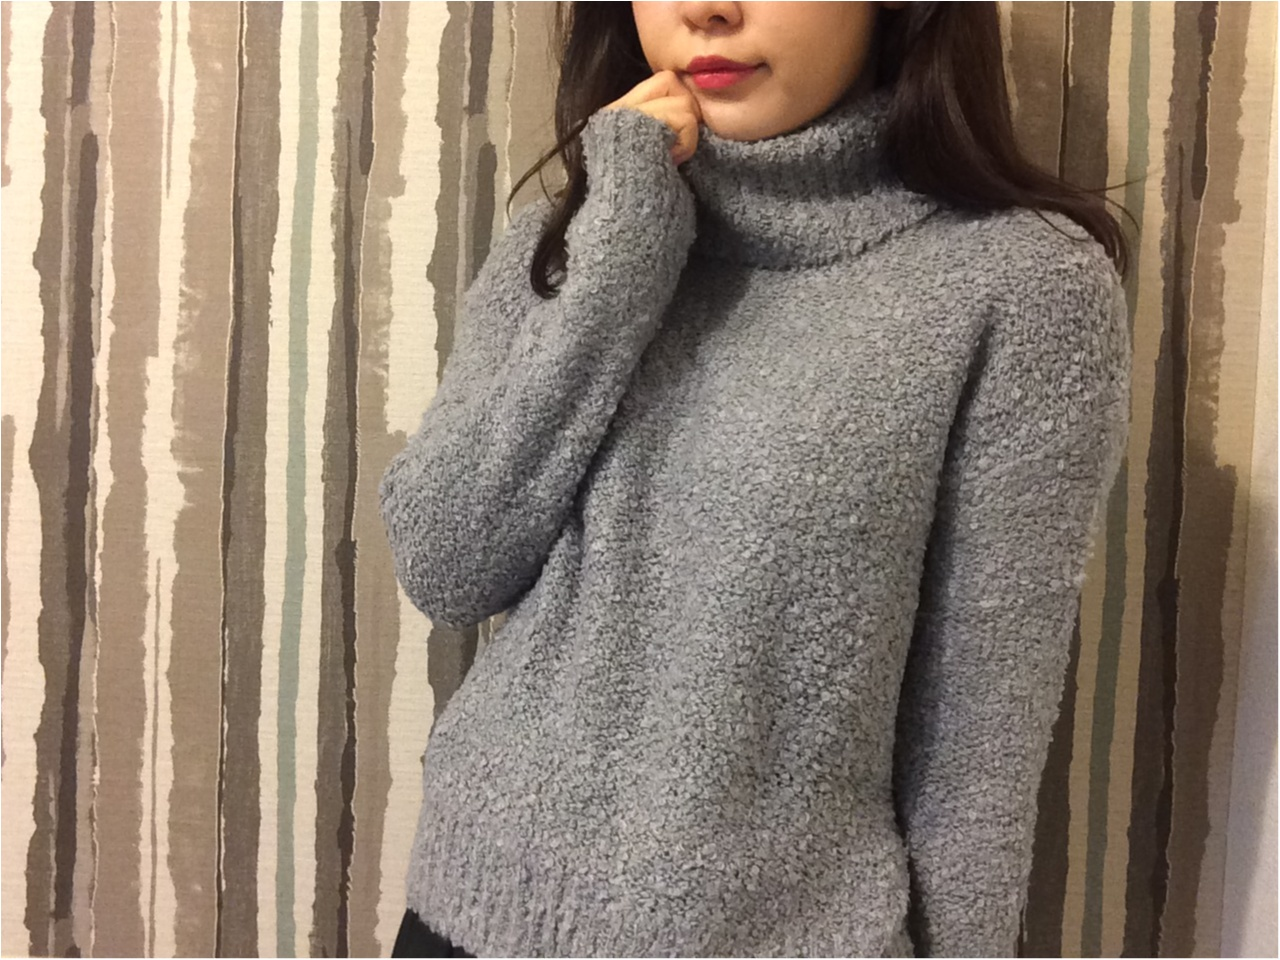 【GU】フワモコセーターで寒い冬に備えよう♡_2